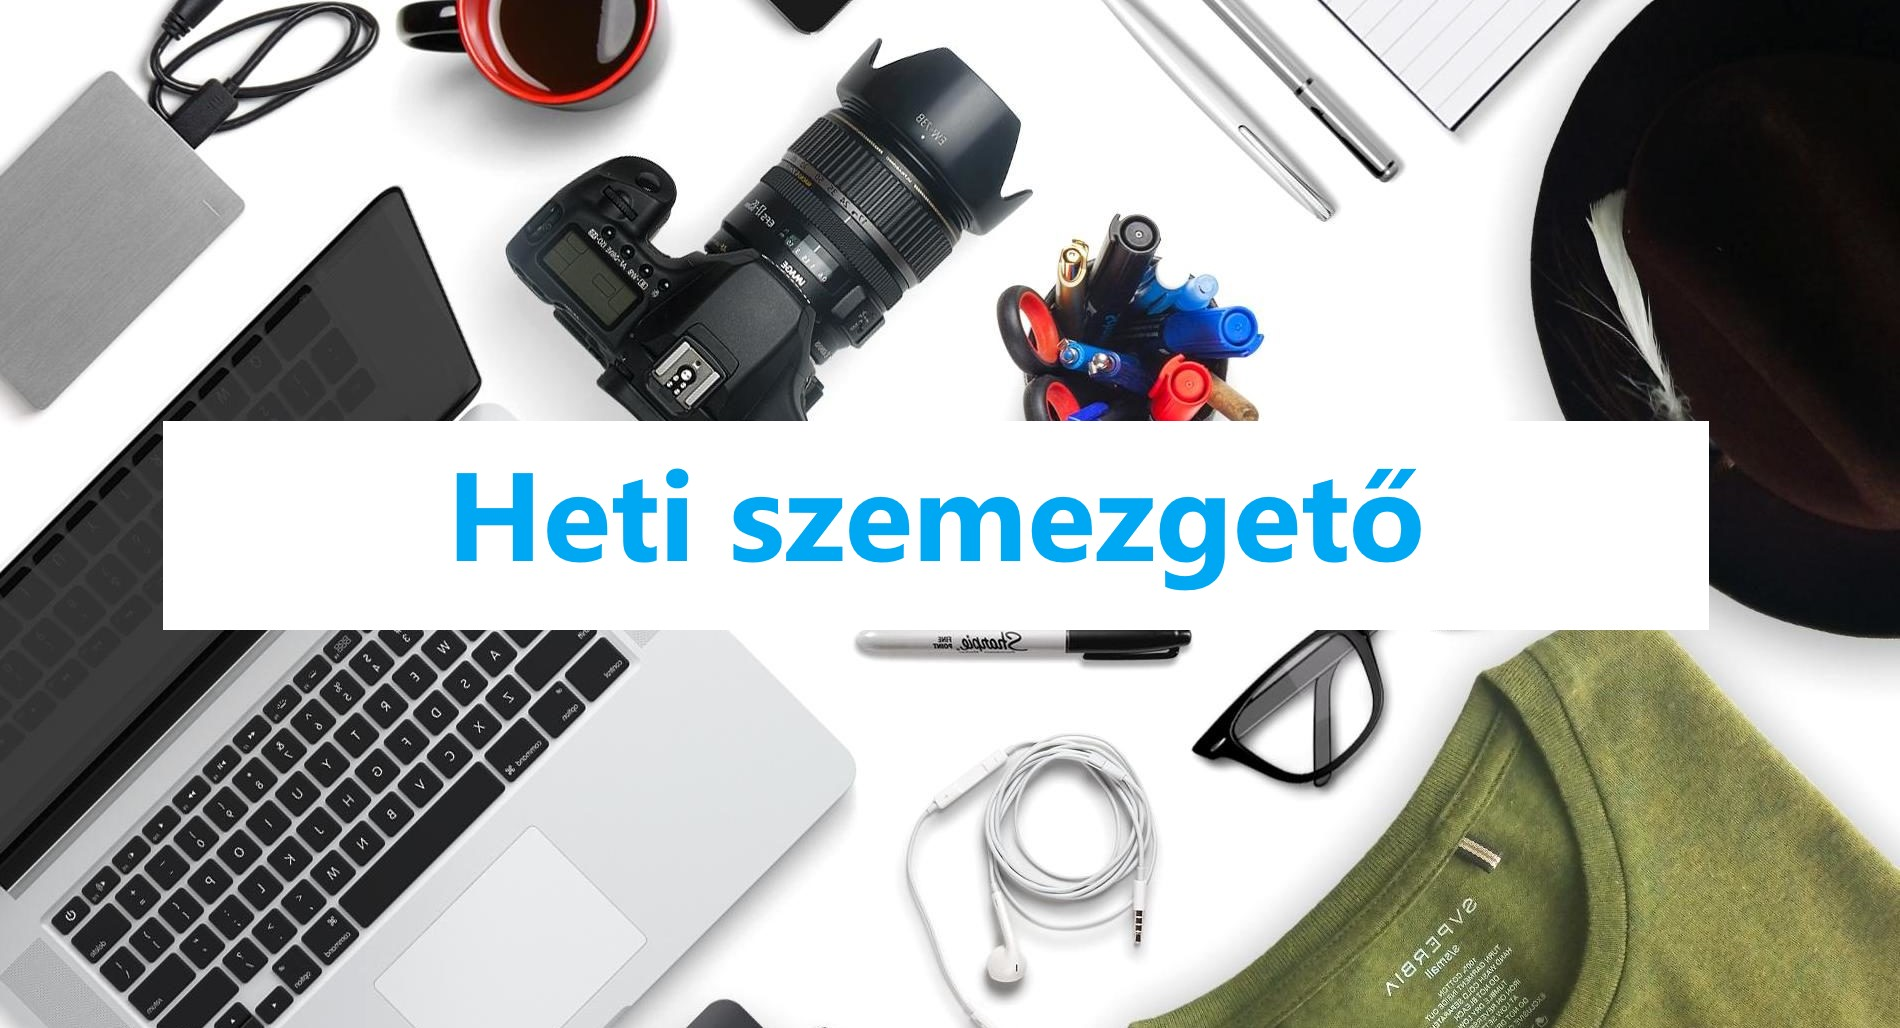 heti_szemezgeto_uj_63.jpg